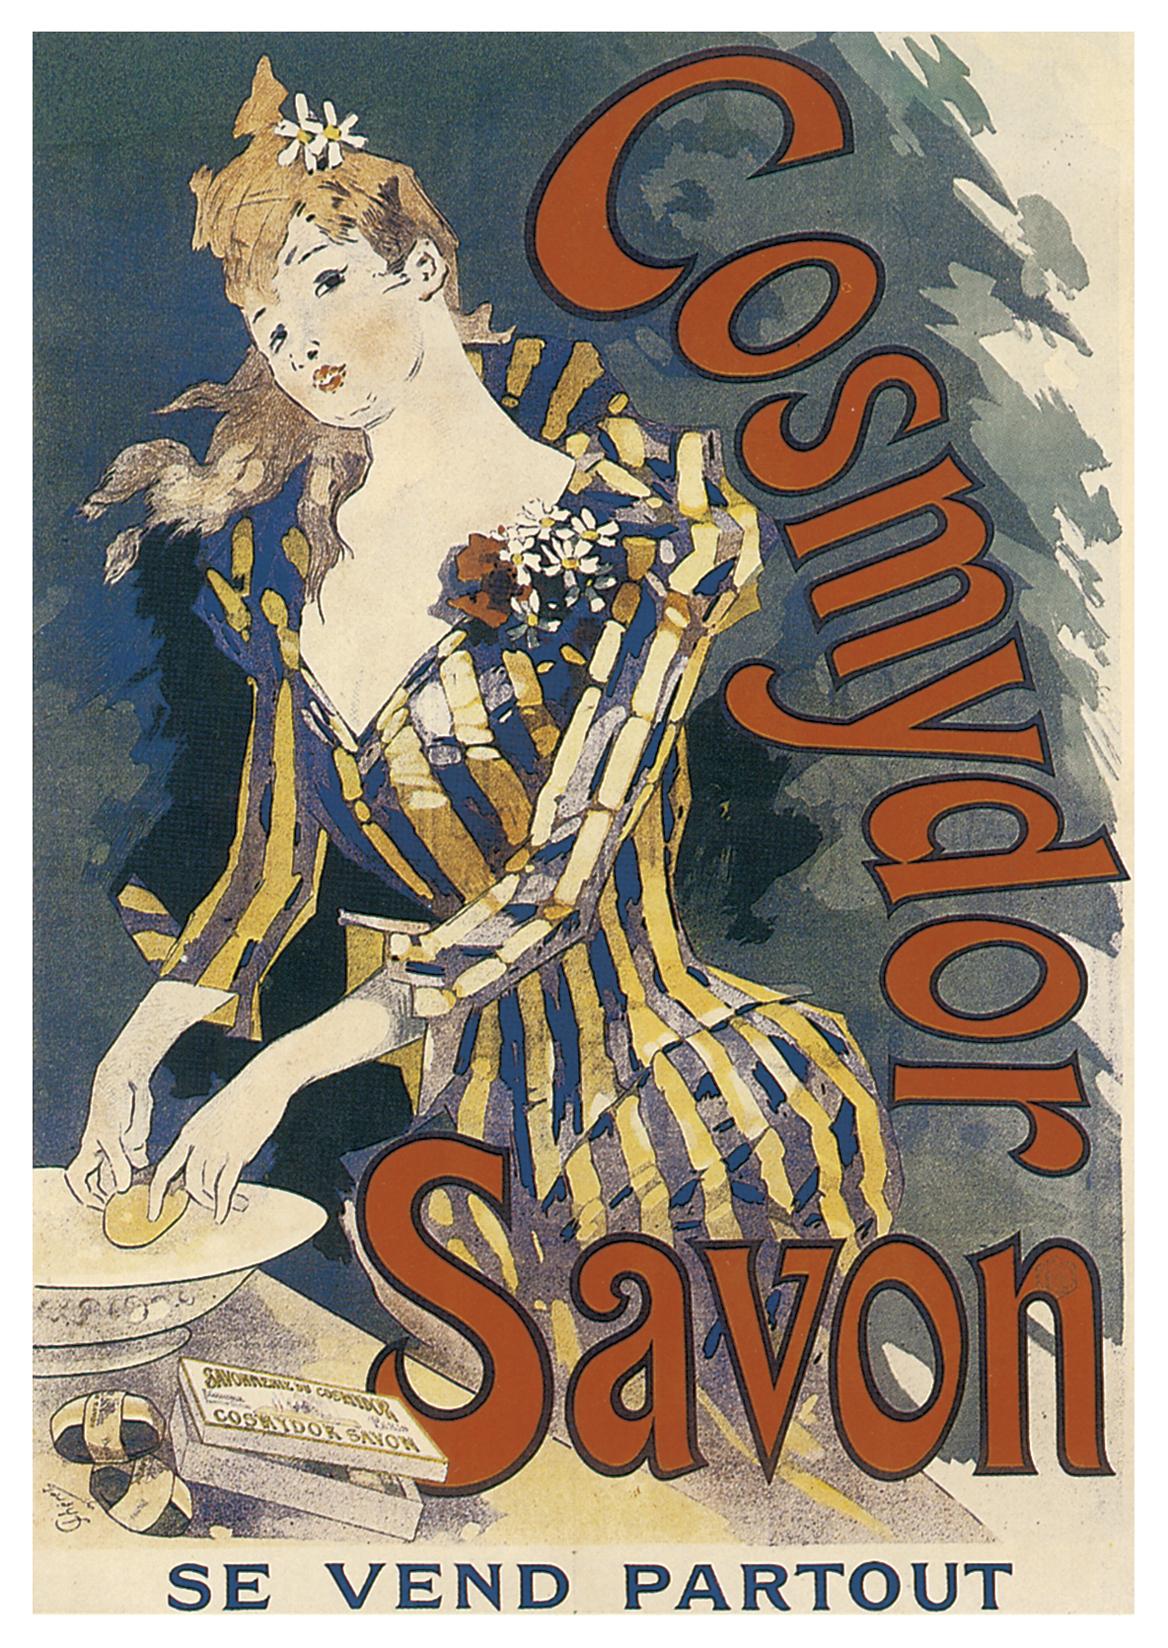 File:Cosmydor Savon.jpg - Wikimedia Commons